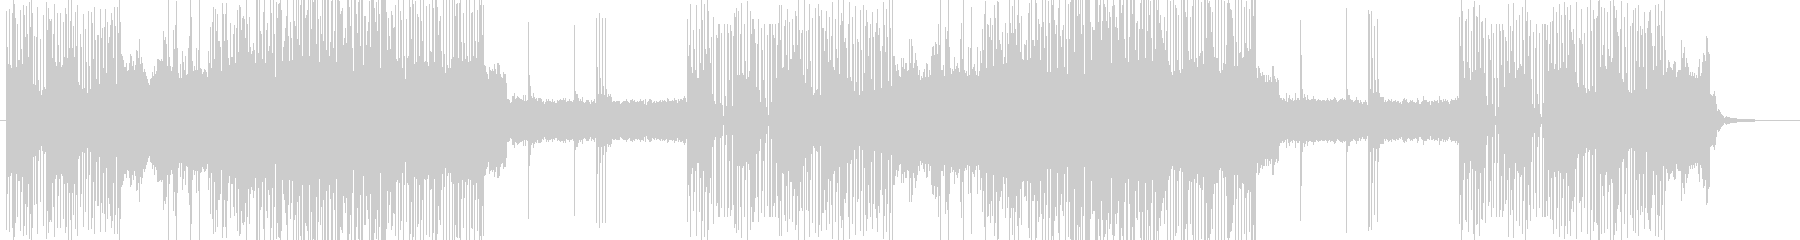 「HR/HM」「DEATH」BGM302の未再生の波形